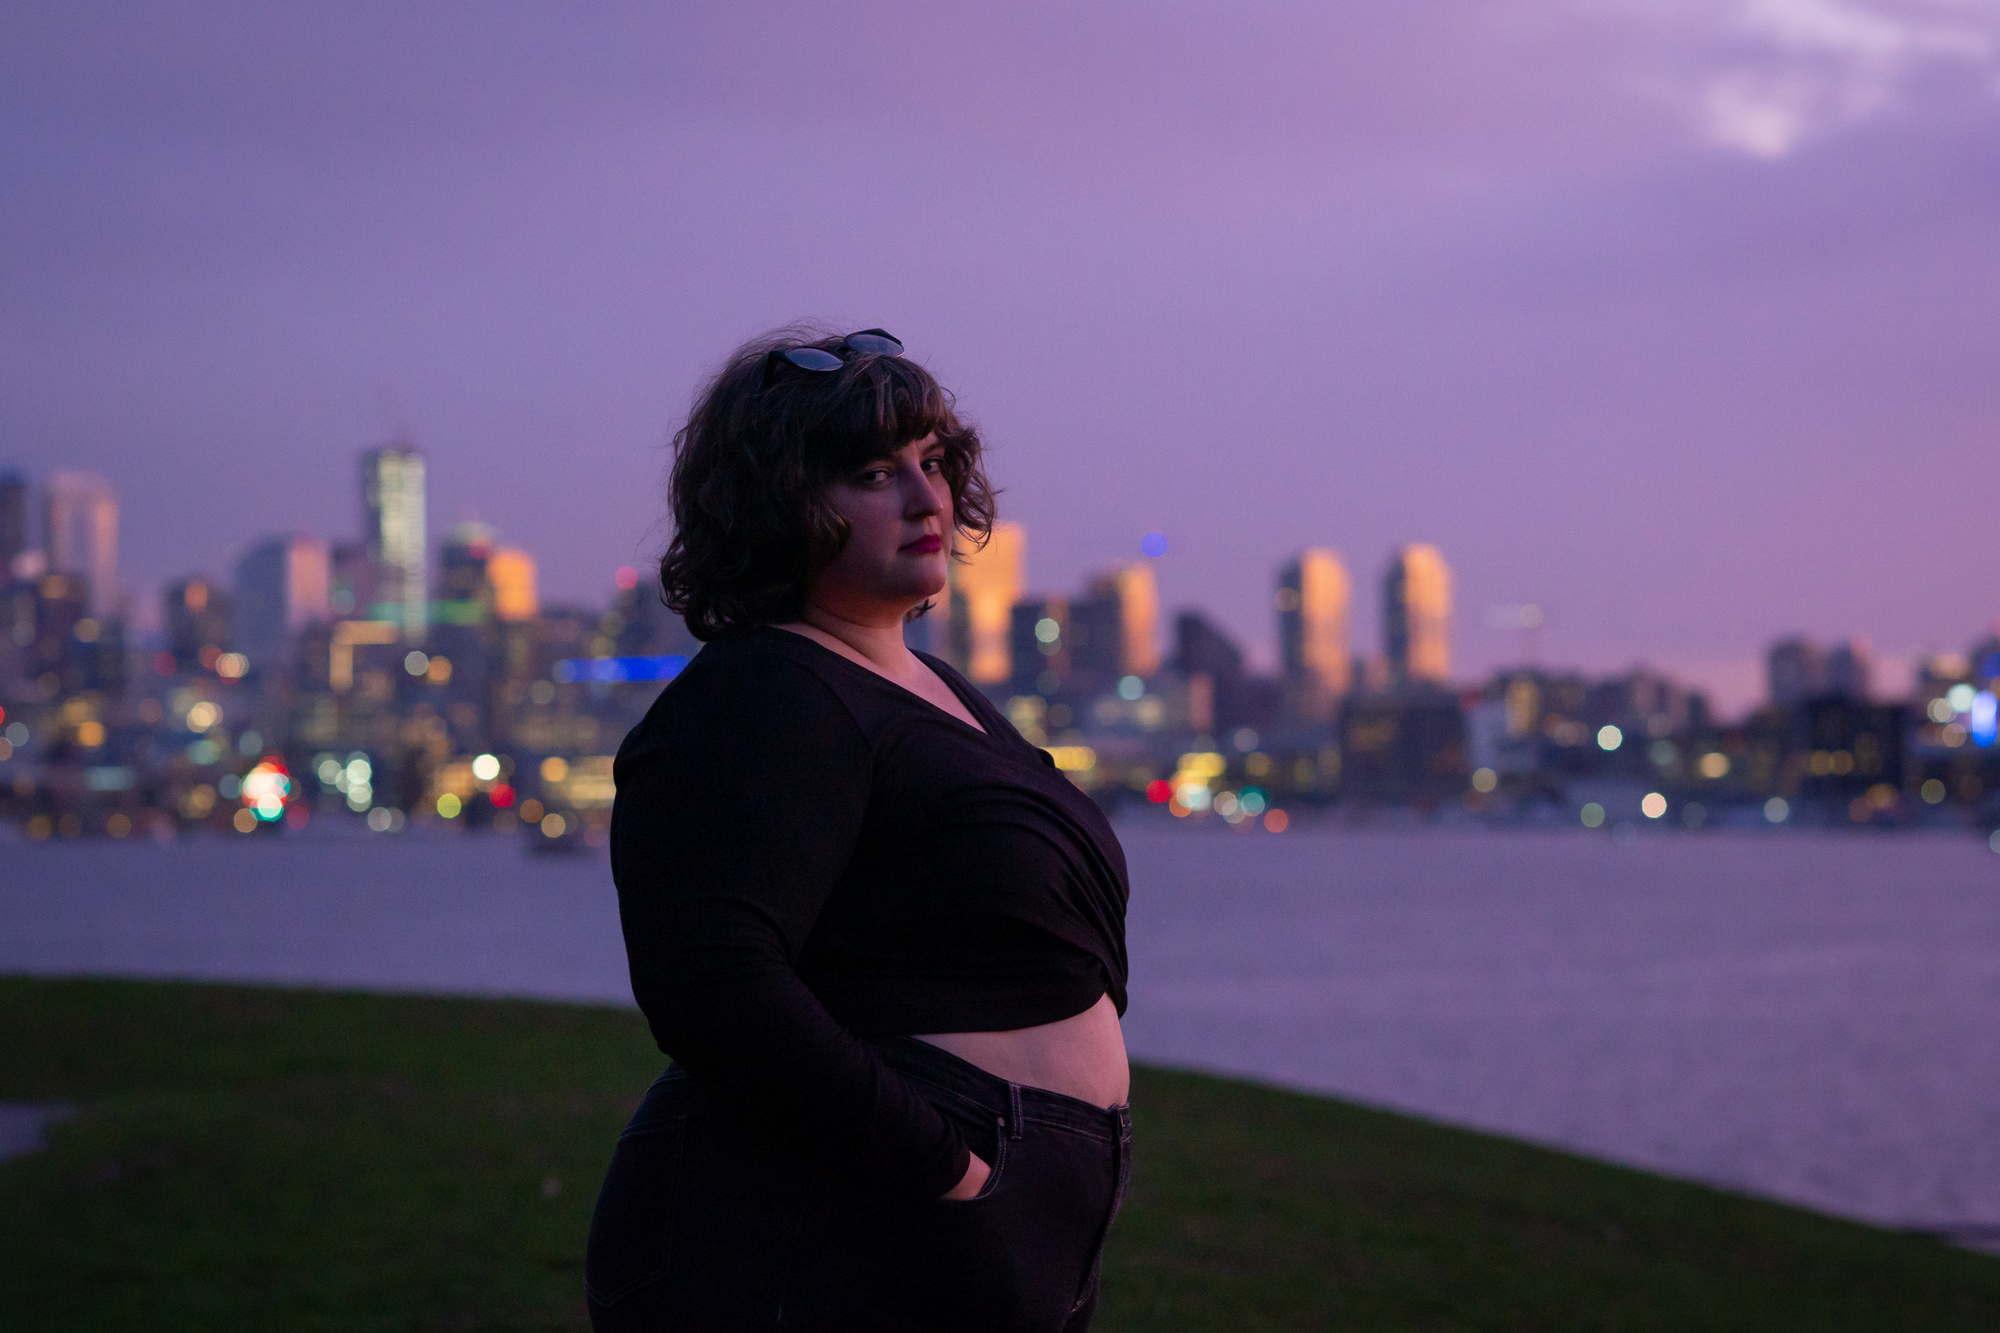 Portraits of J., Gasworks Park, Seattle